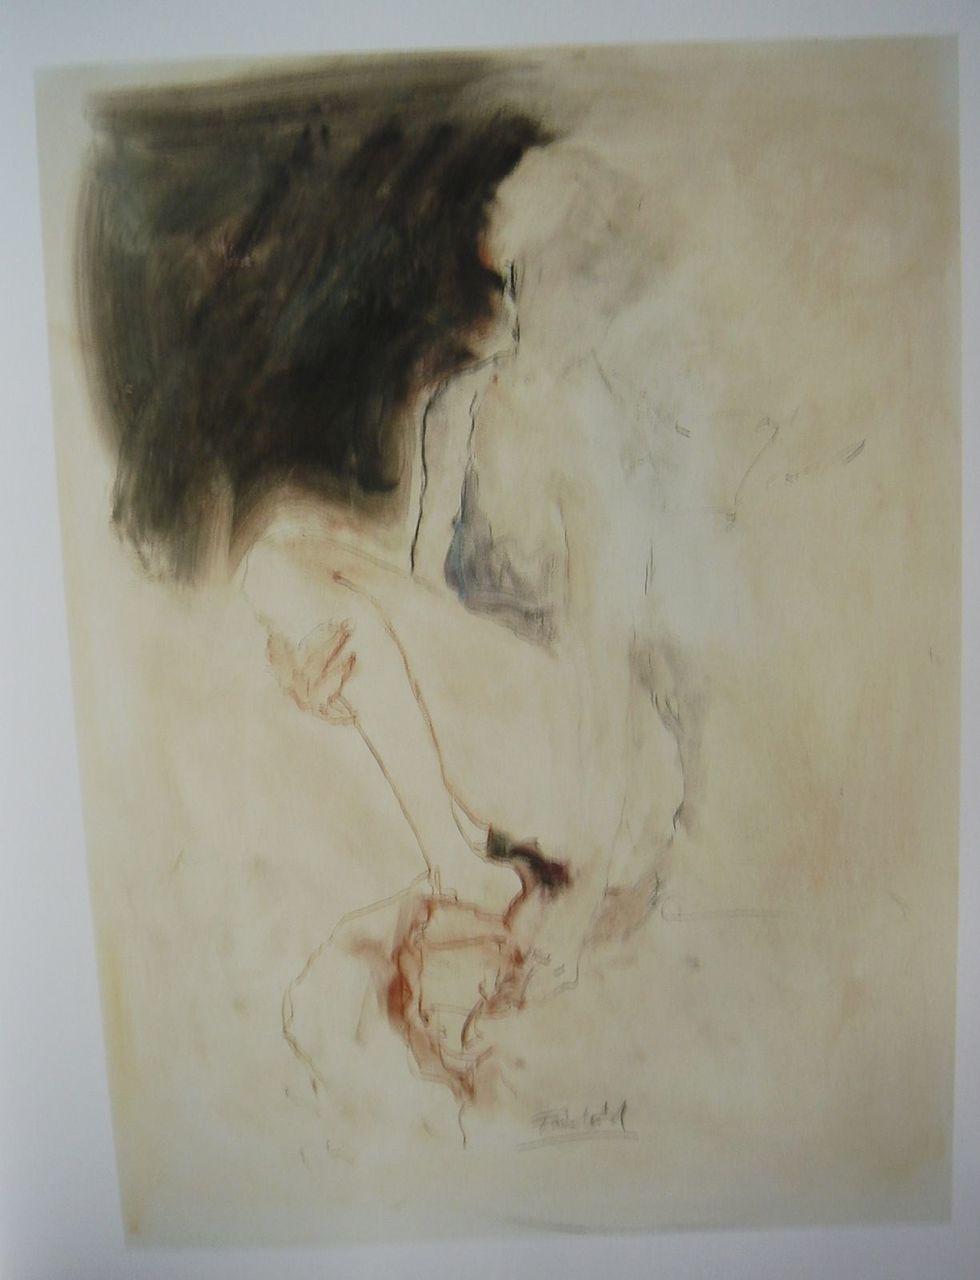 FAIRCHILD, by John Gilboy - 1993 [Artist Signed]